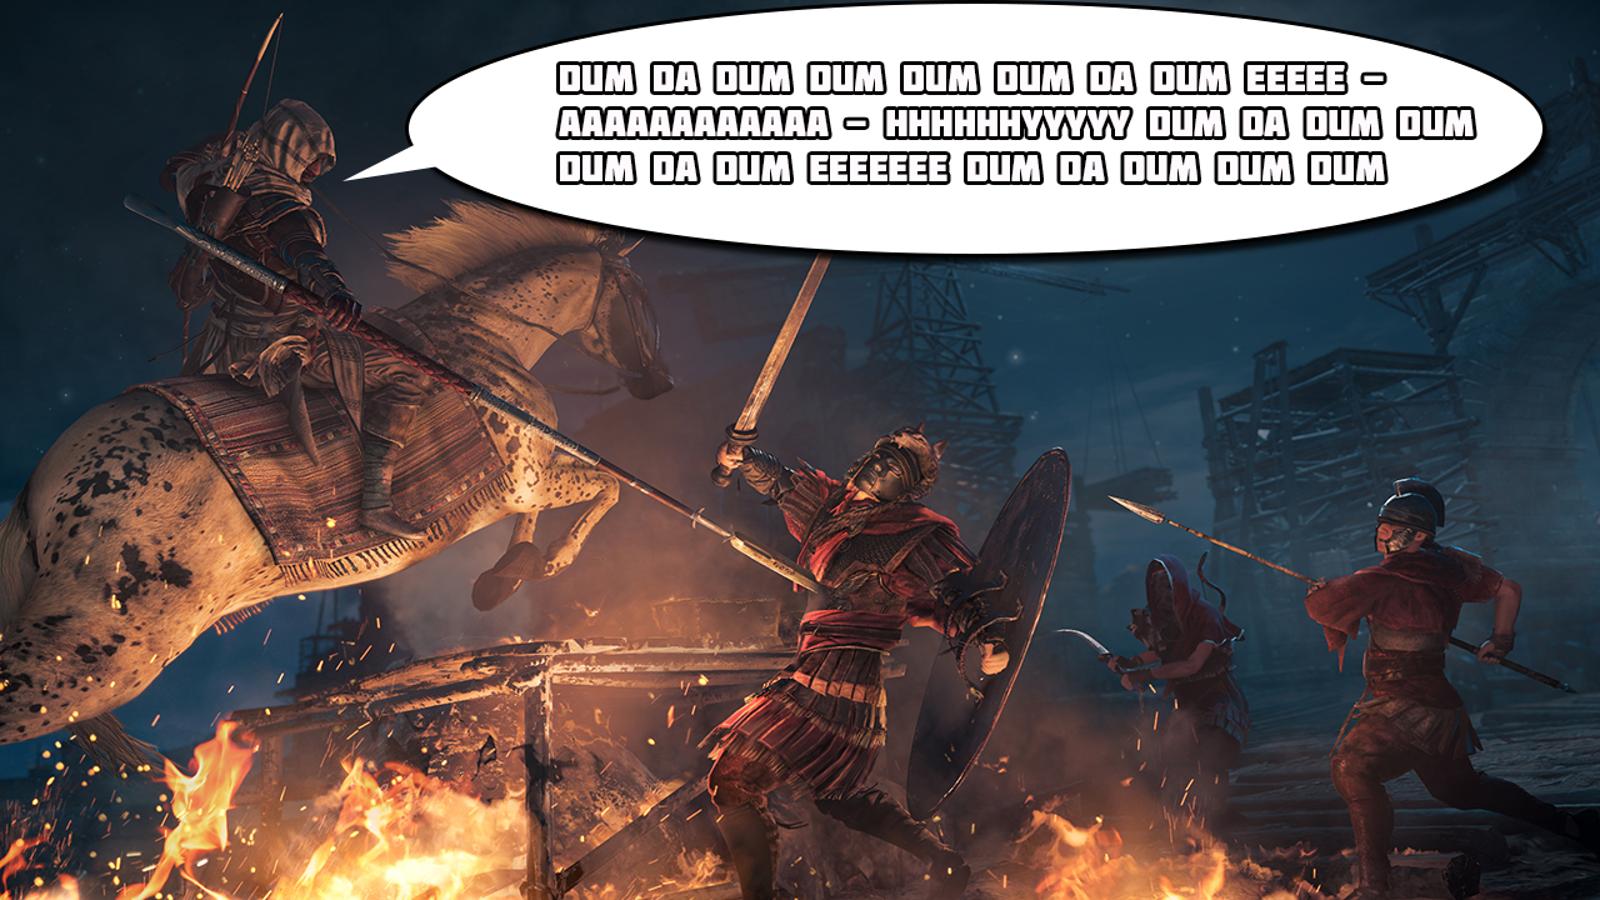 Assassin's Creed Origins Composer Posts Unreleased Tracks